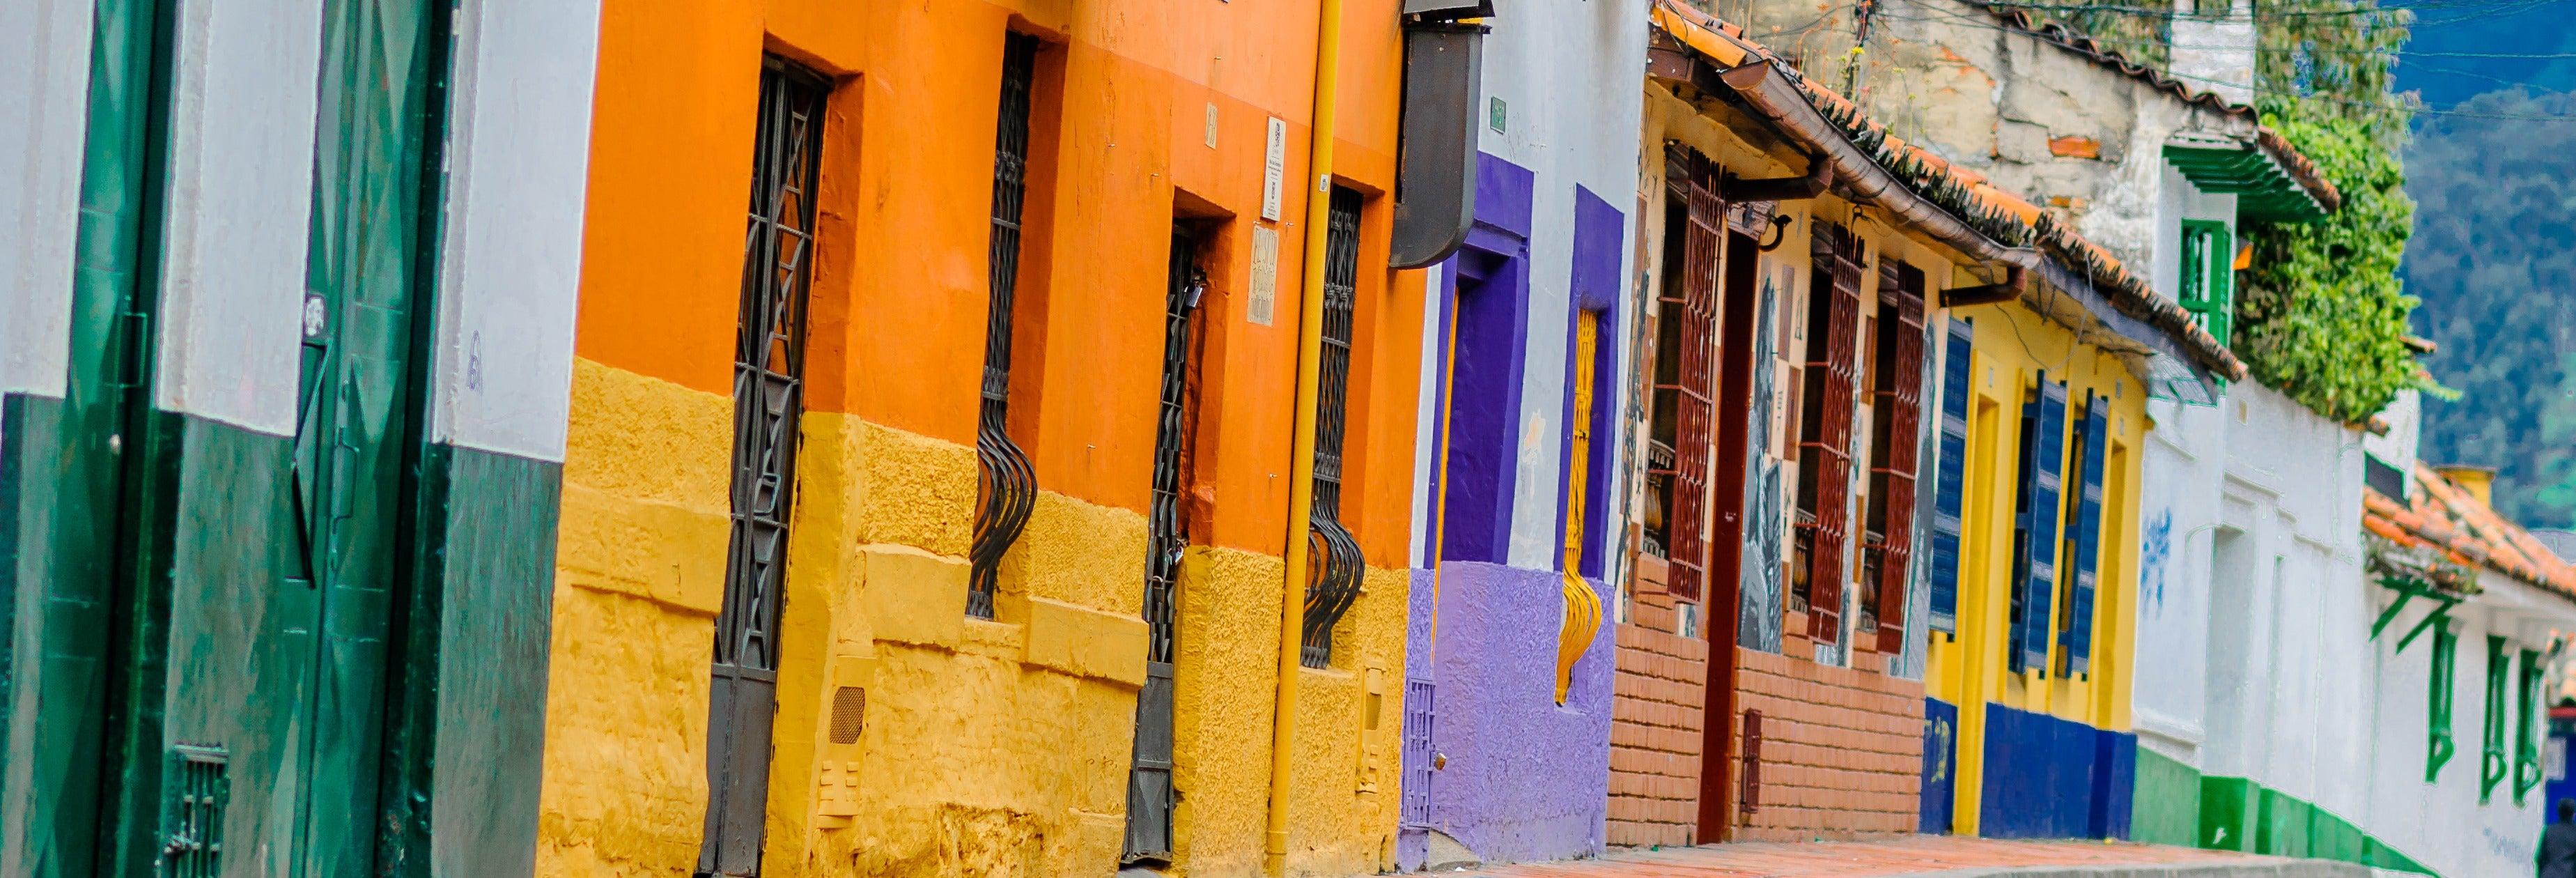 Free tour de contrastes de Bogotá ¡Gratis!